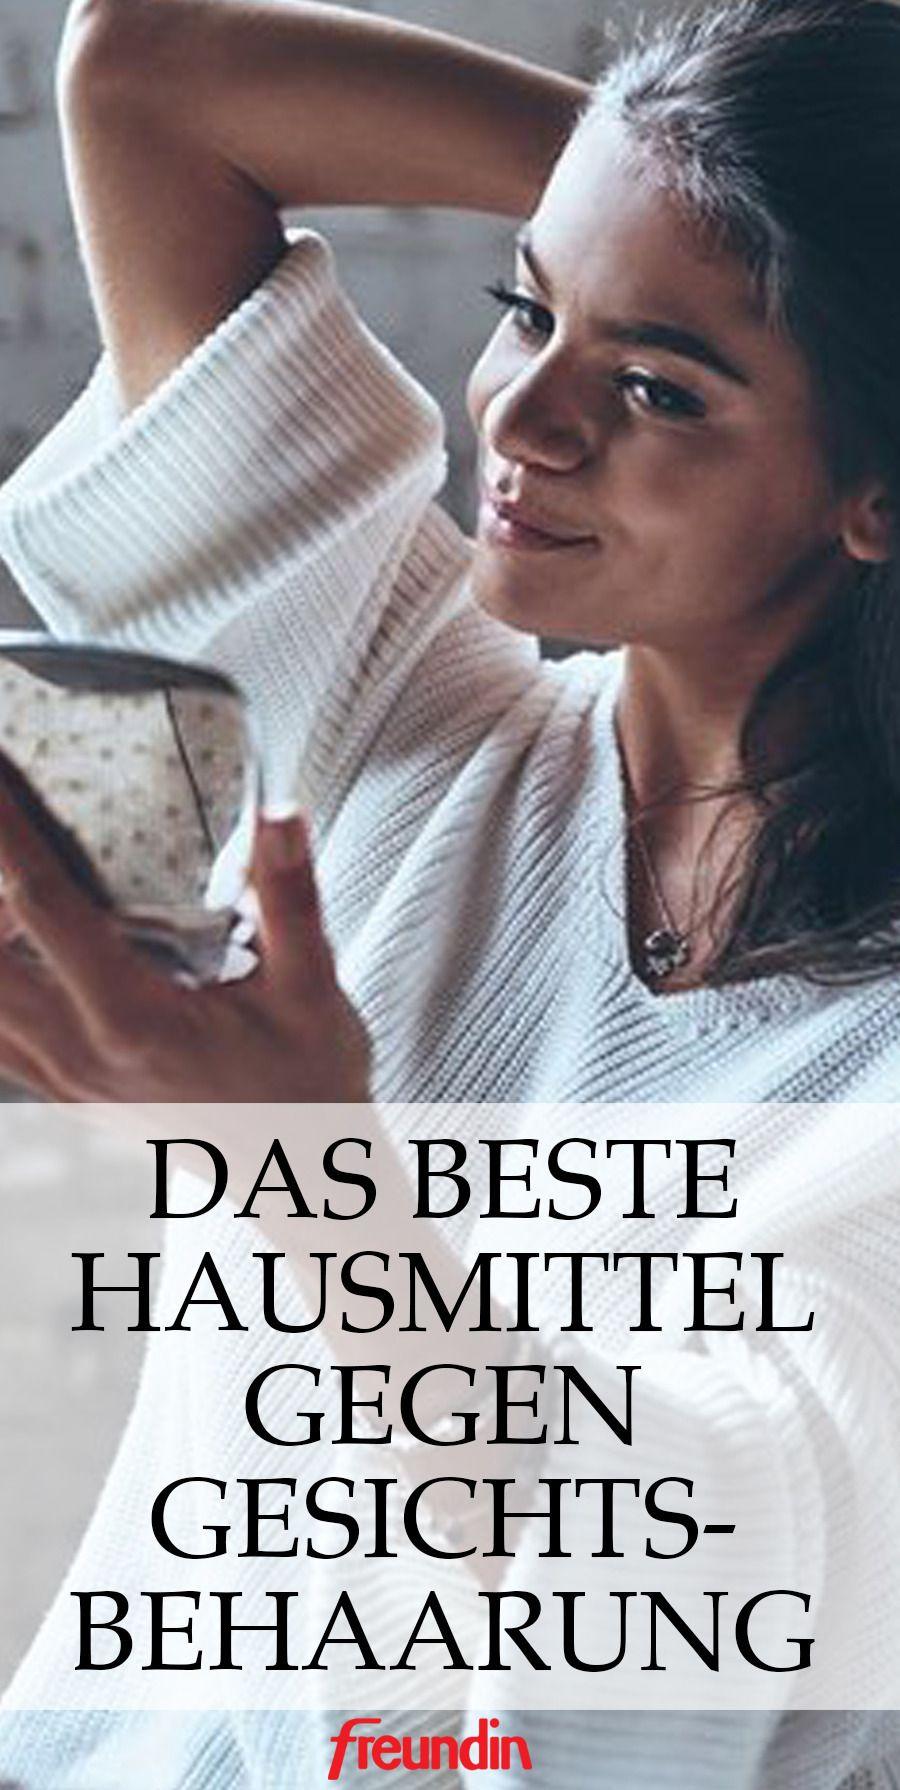 Photo of Dieses Hausmittel hilft gegen Gesichtsbehaarung | freundin.de